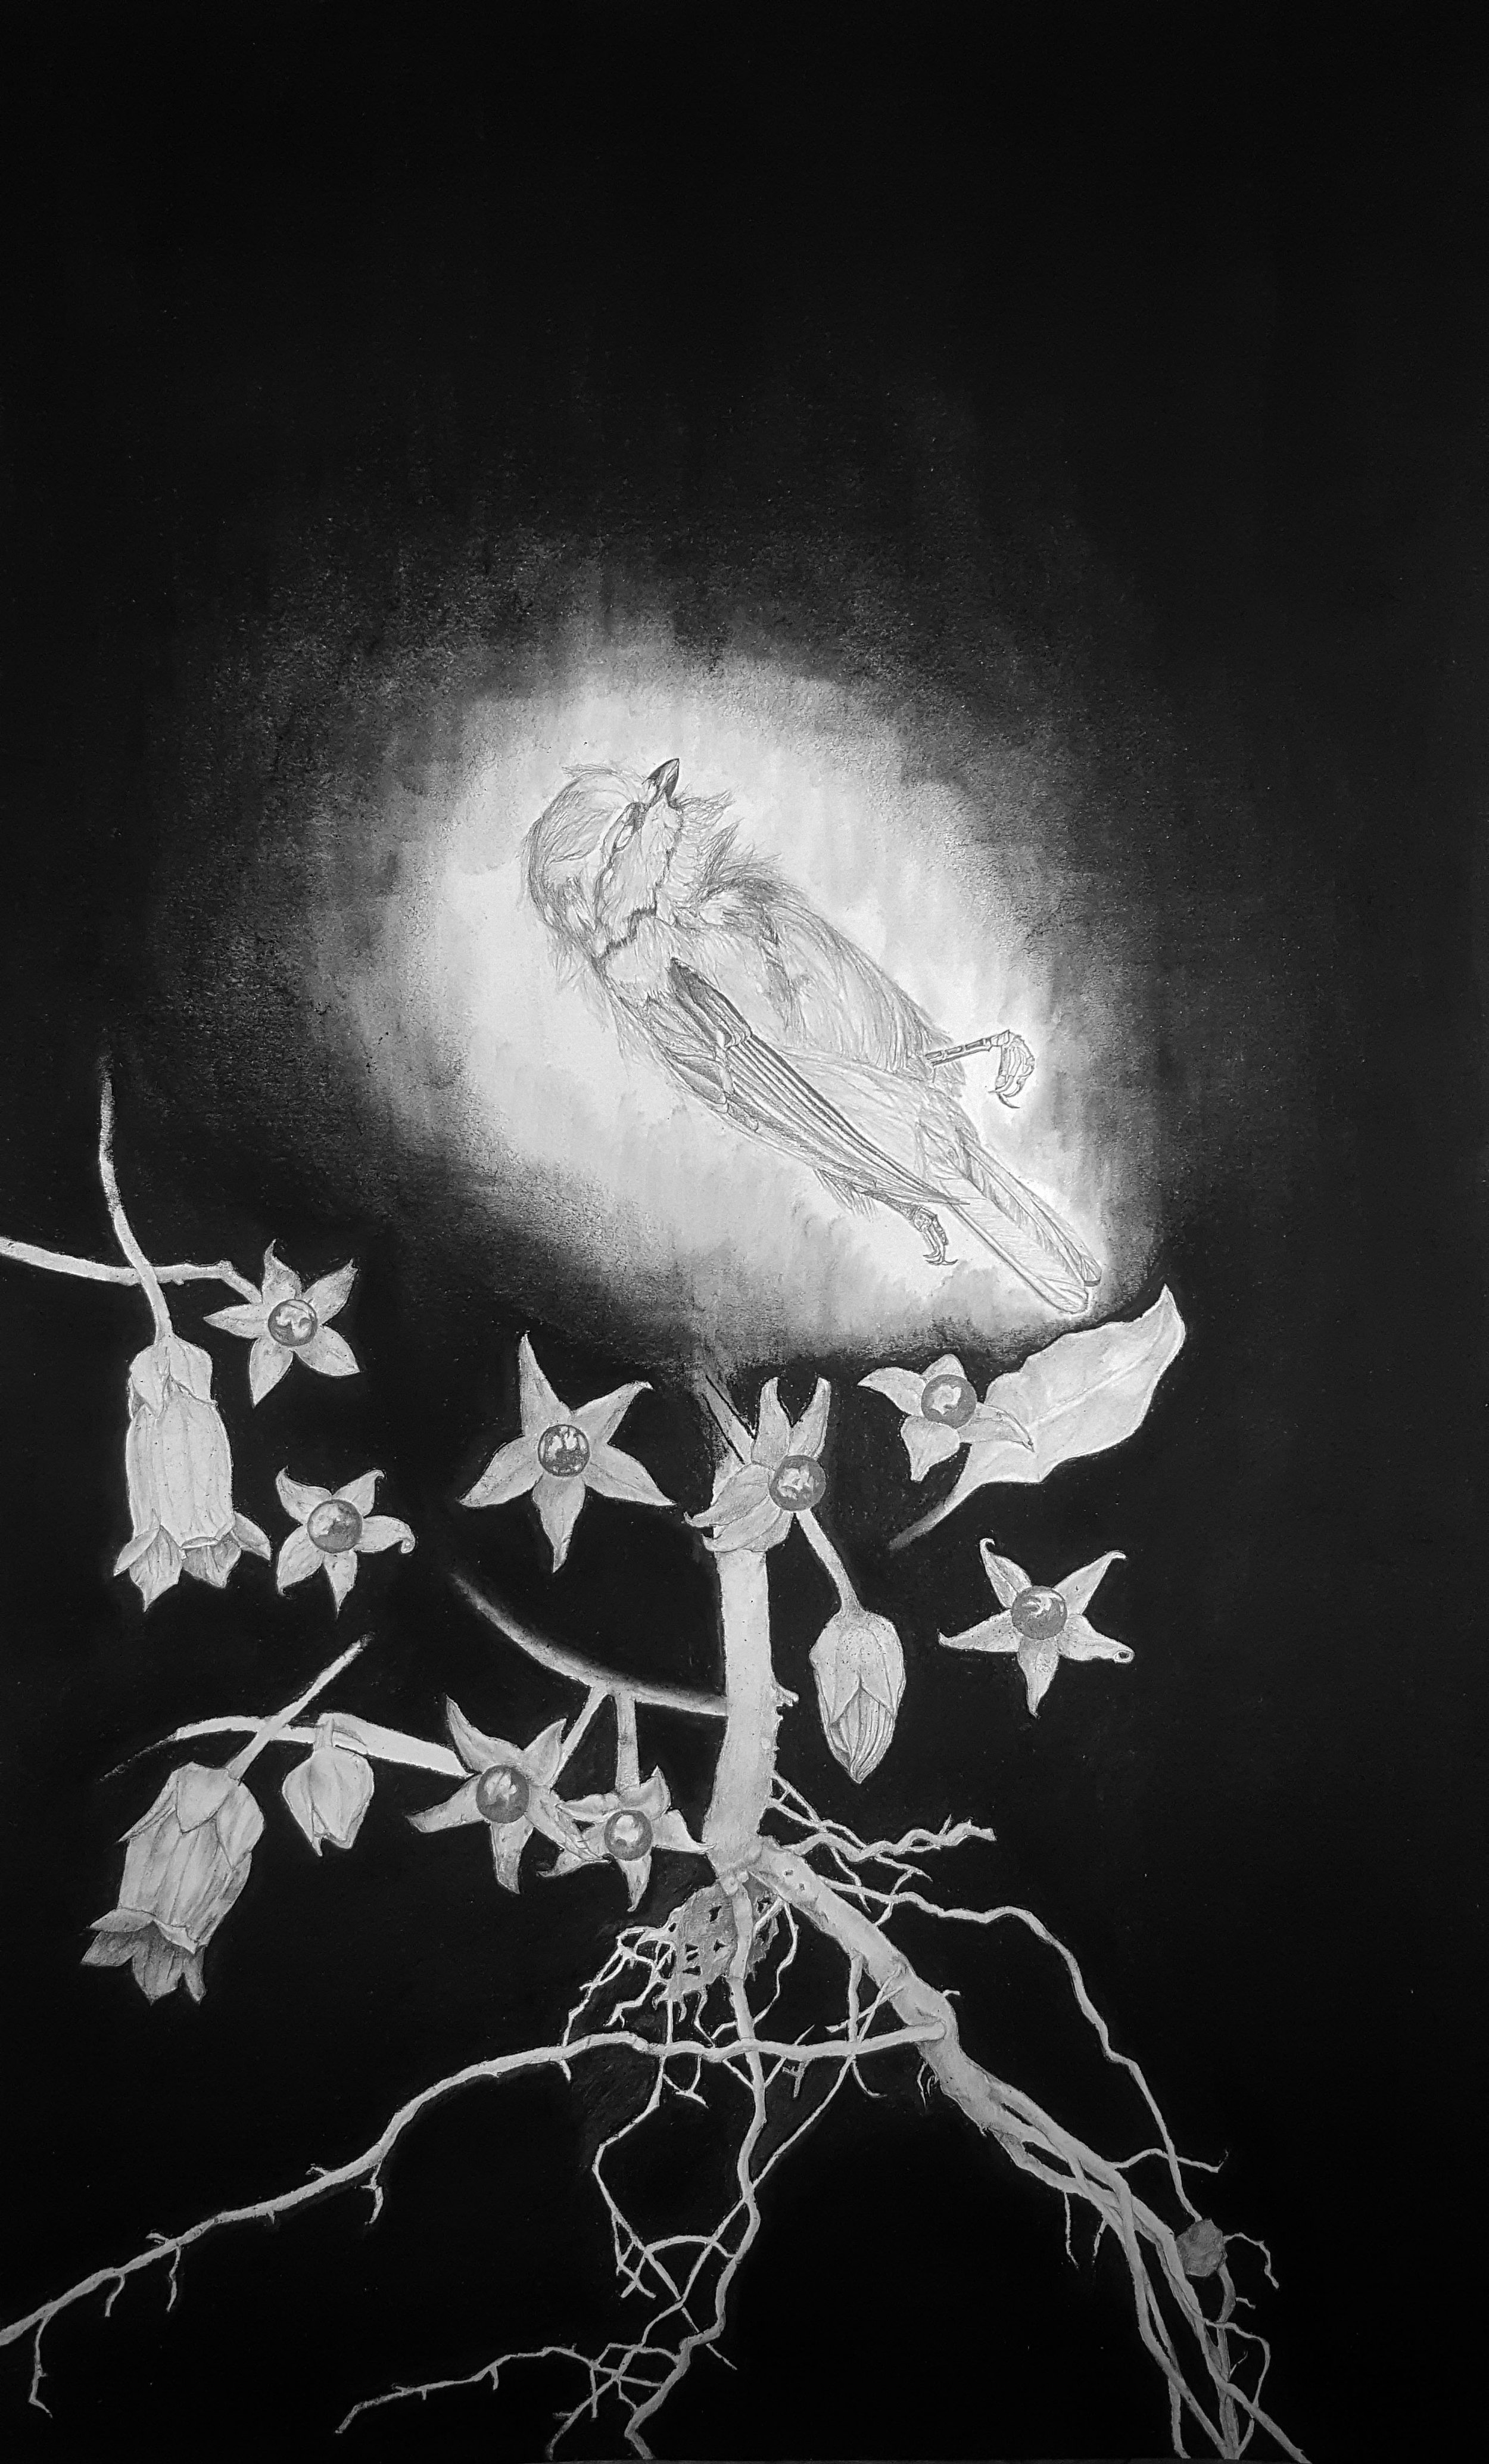 Belladonna, the Fallen